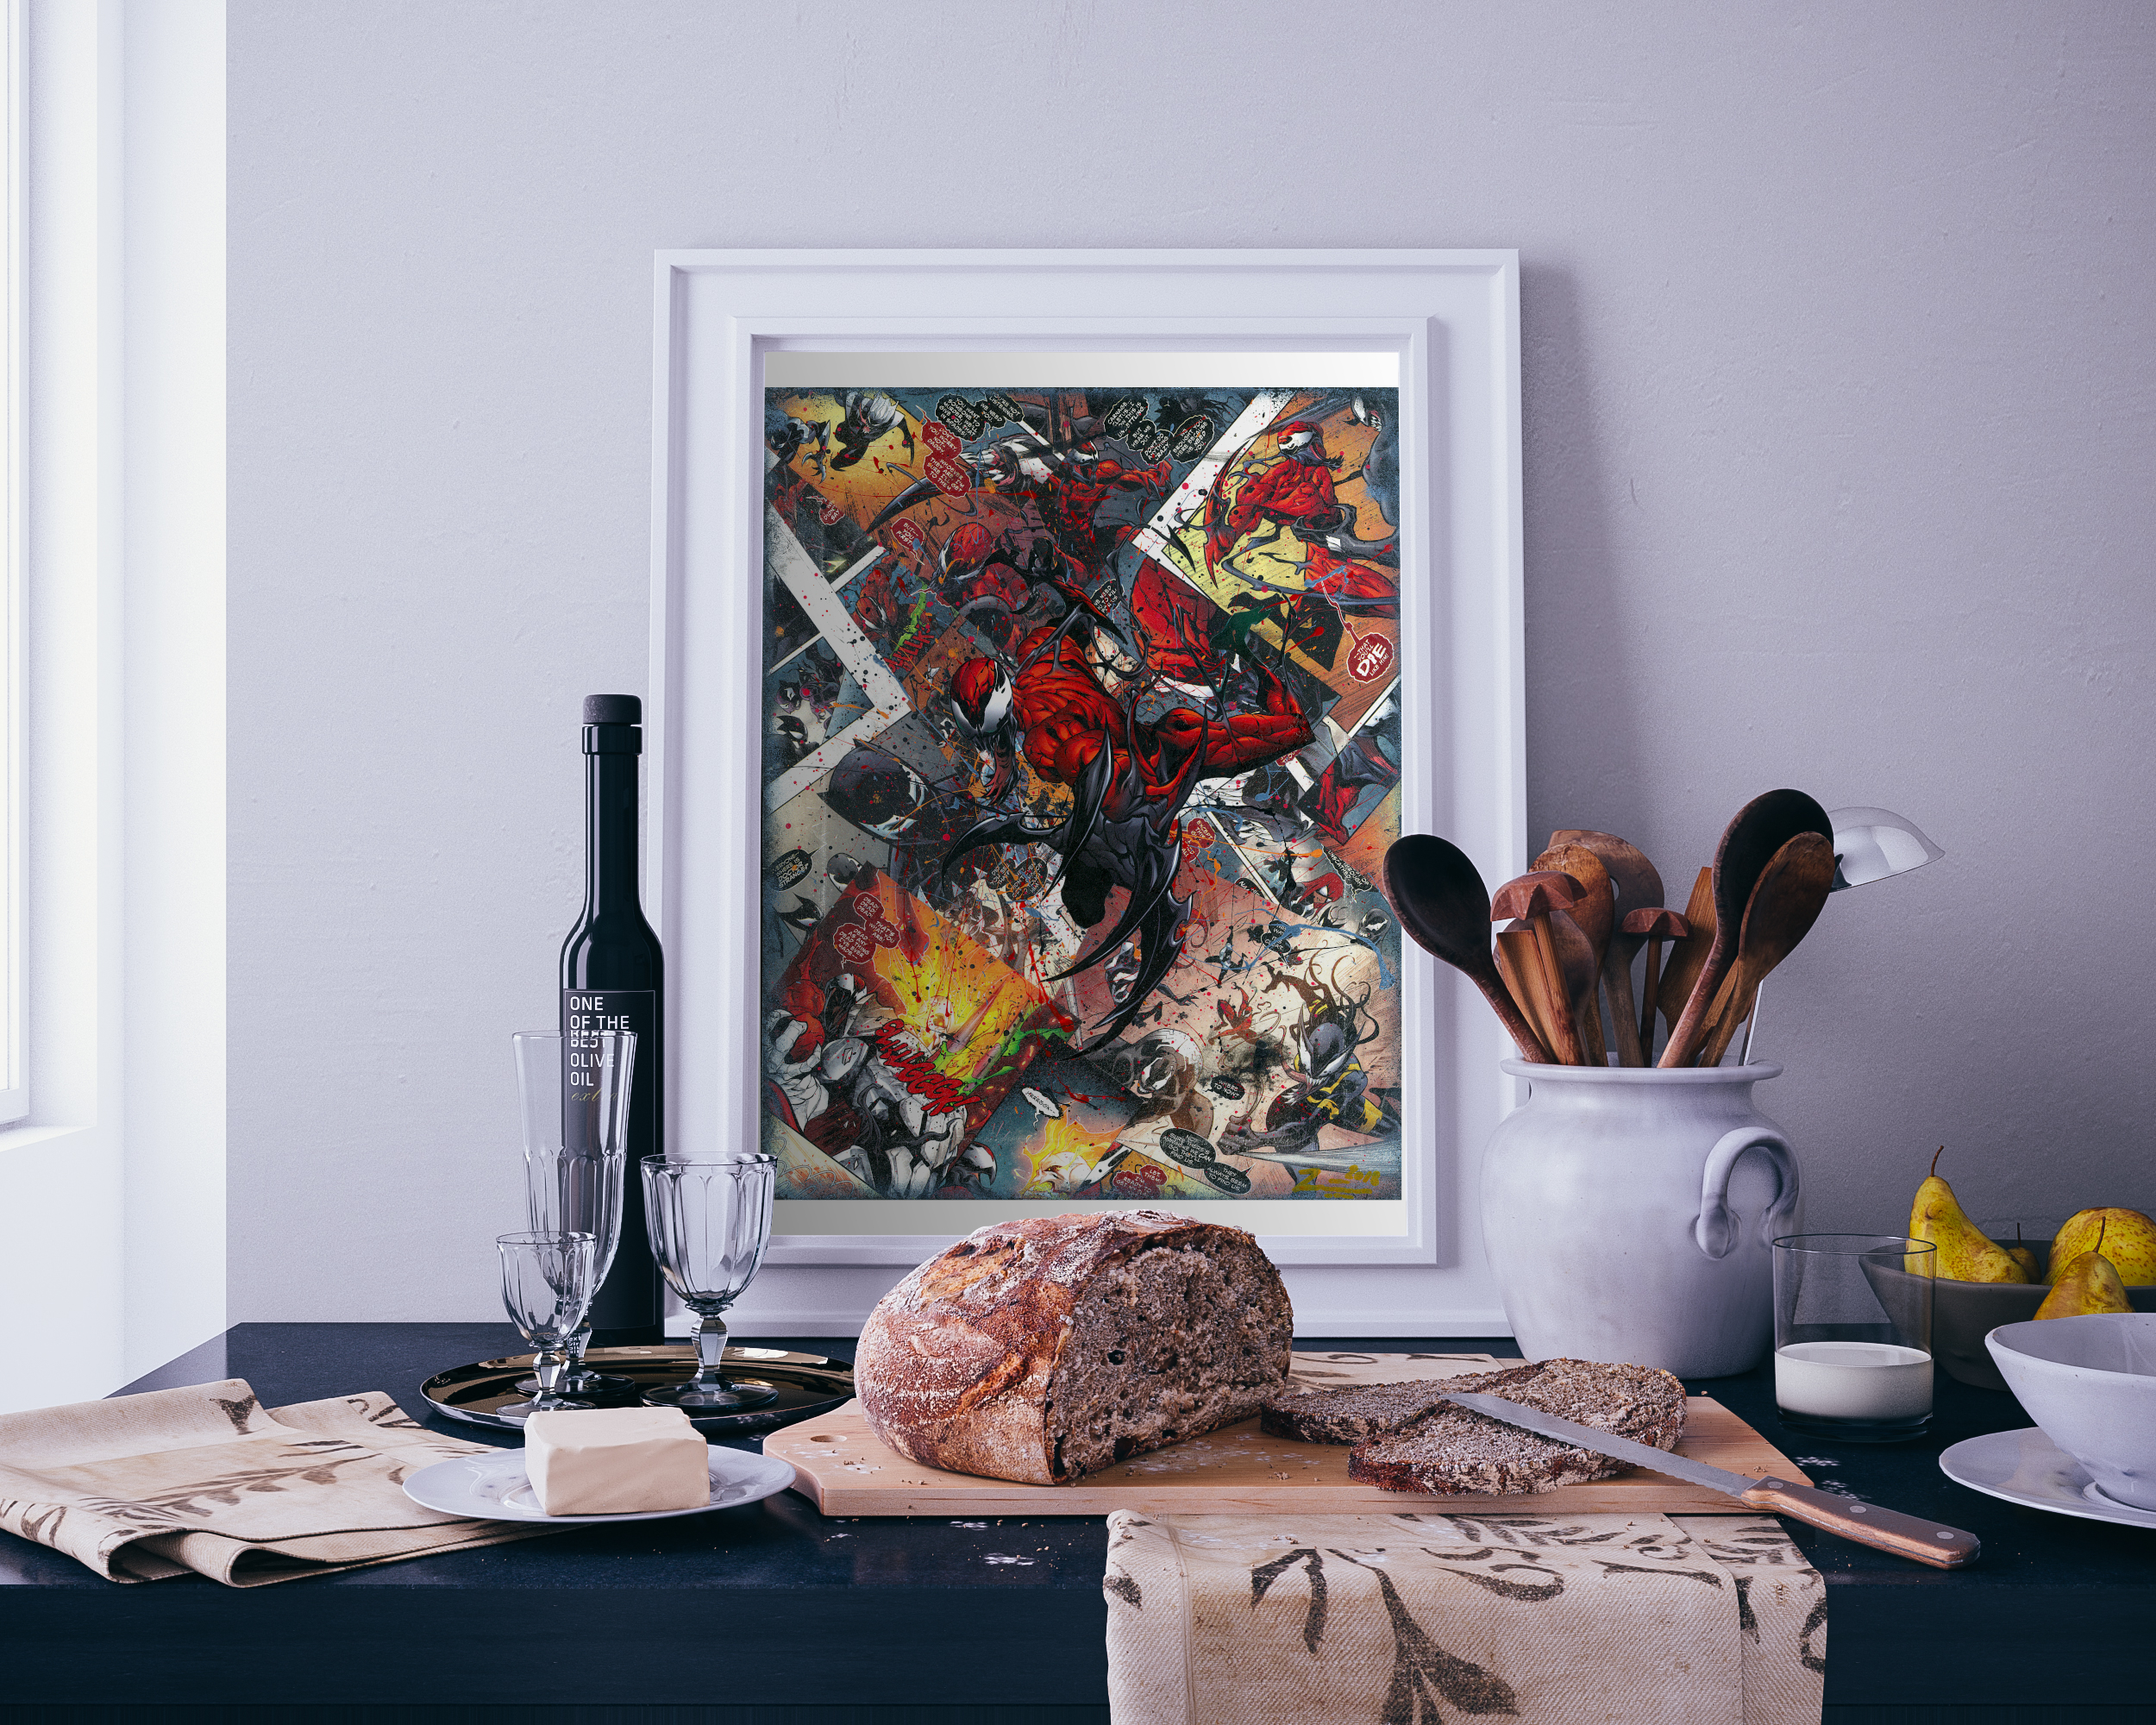 Carnage-Venomverse-Kitchen-Bread-Mockup